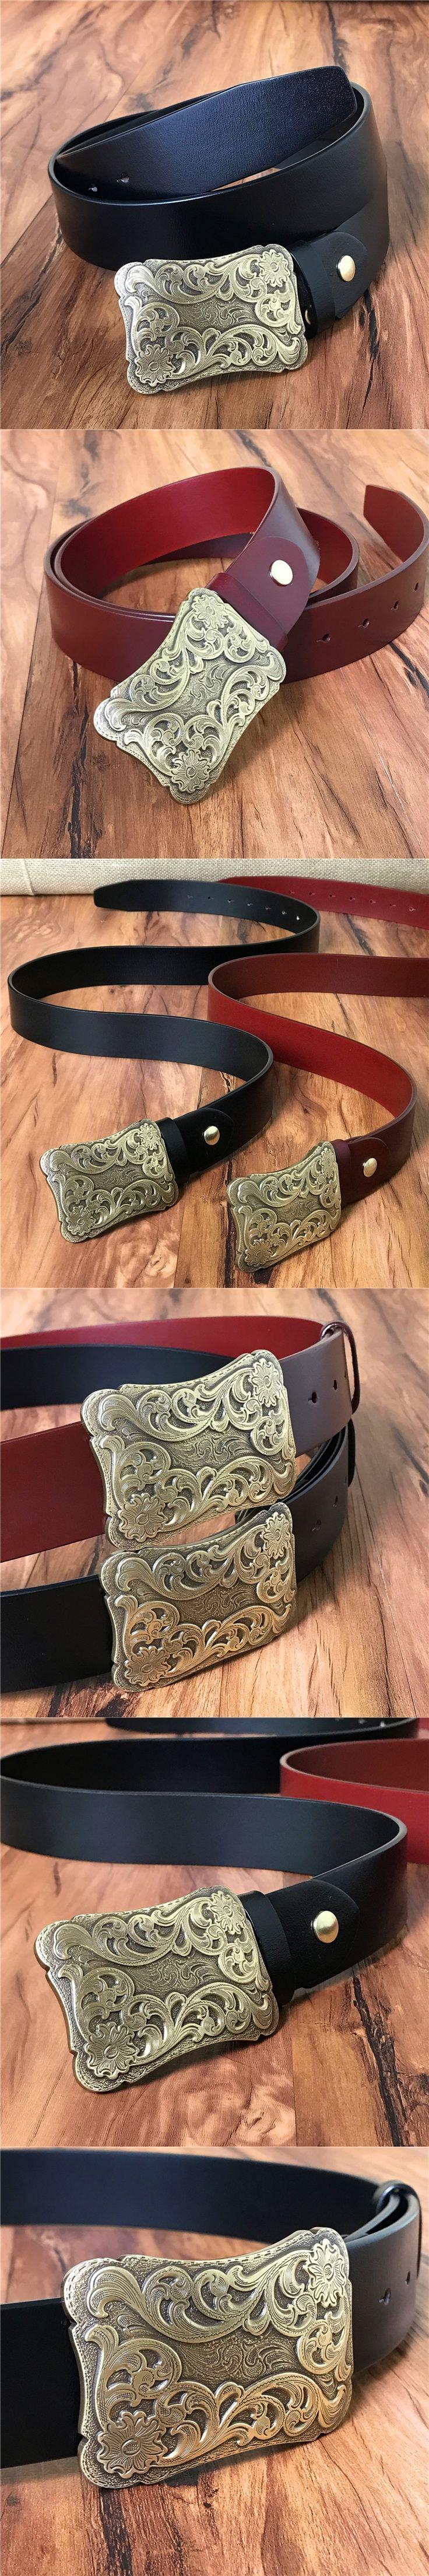 Vintage Style Brass Belt Buckle Mens Belts Luxury Genuine Leather Belts For Men Ceinture Homme Cowboy Cinturones Hombre MBT0286